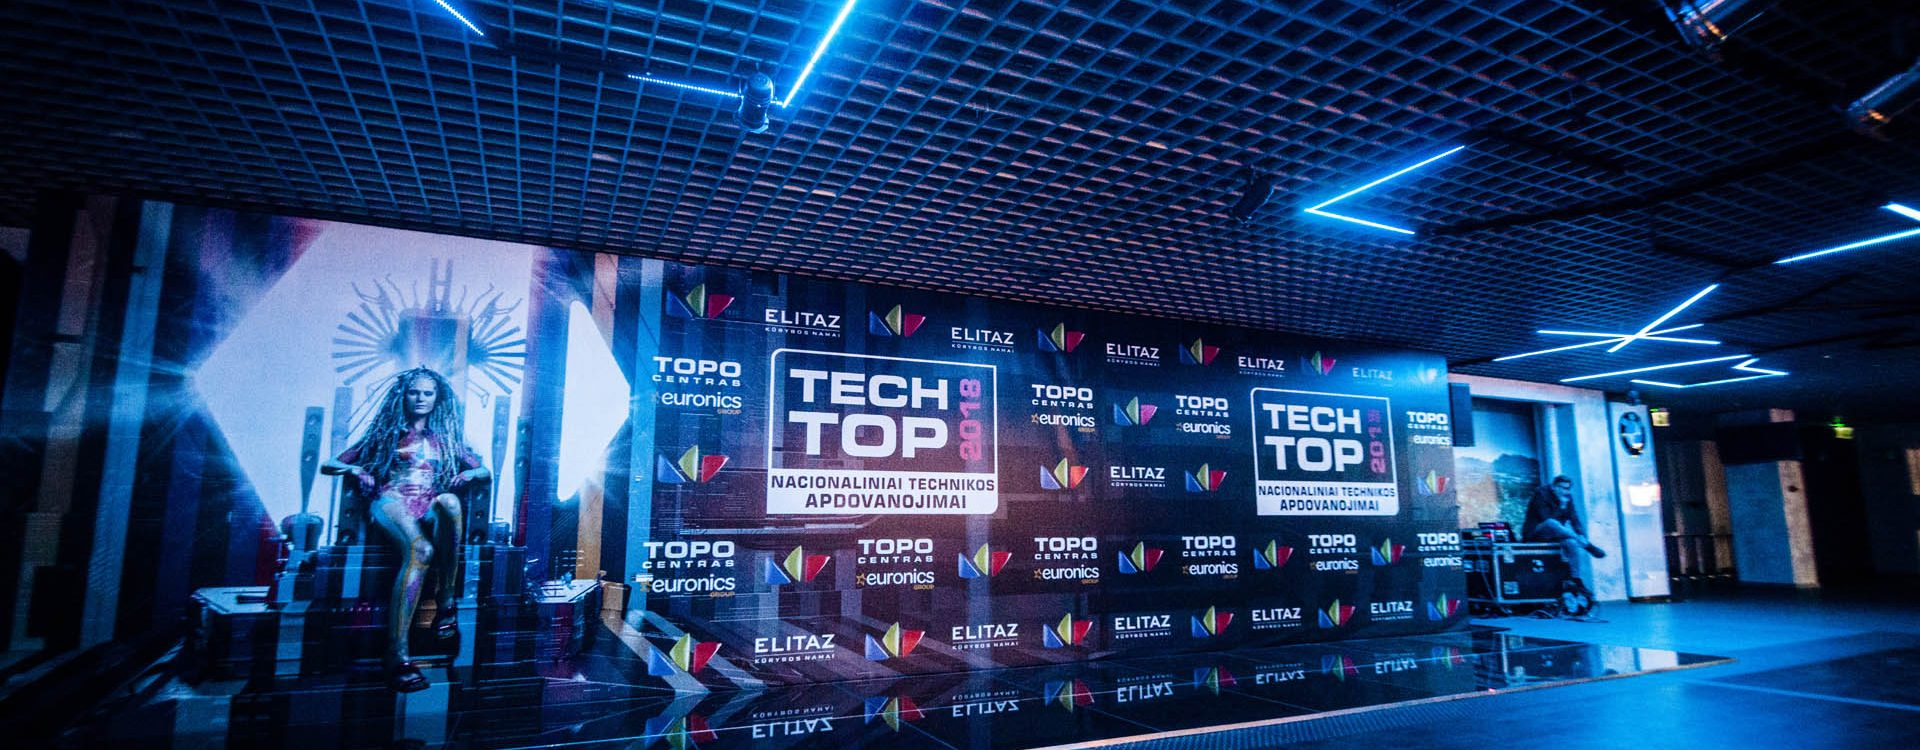 Top Tech 2018